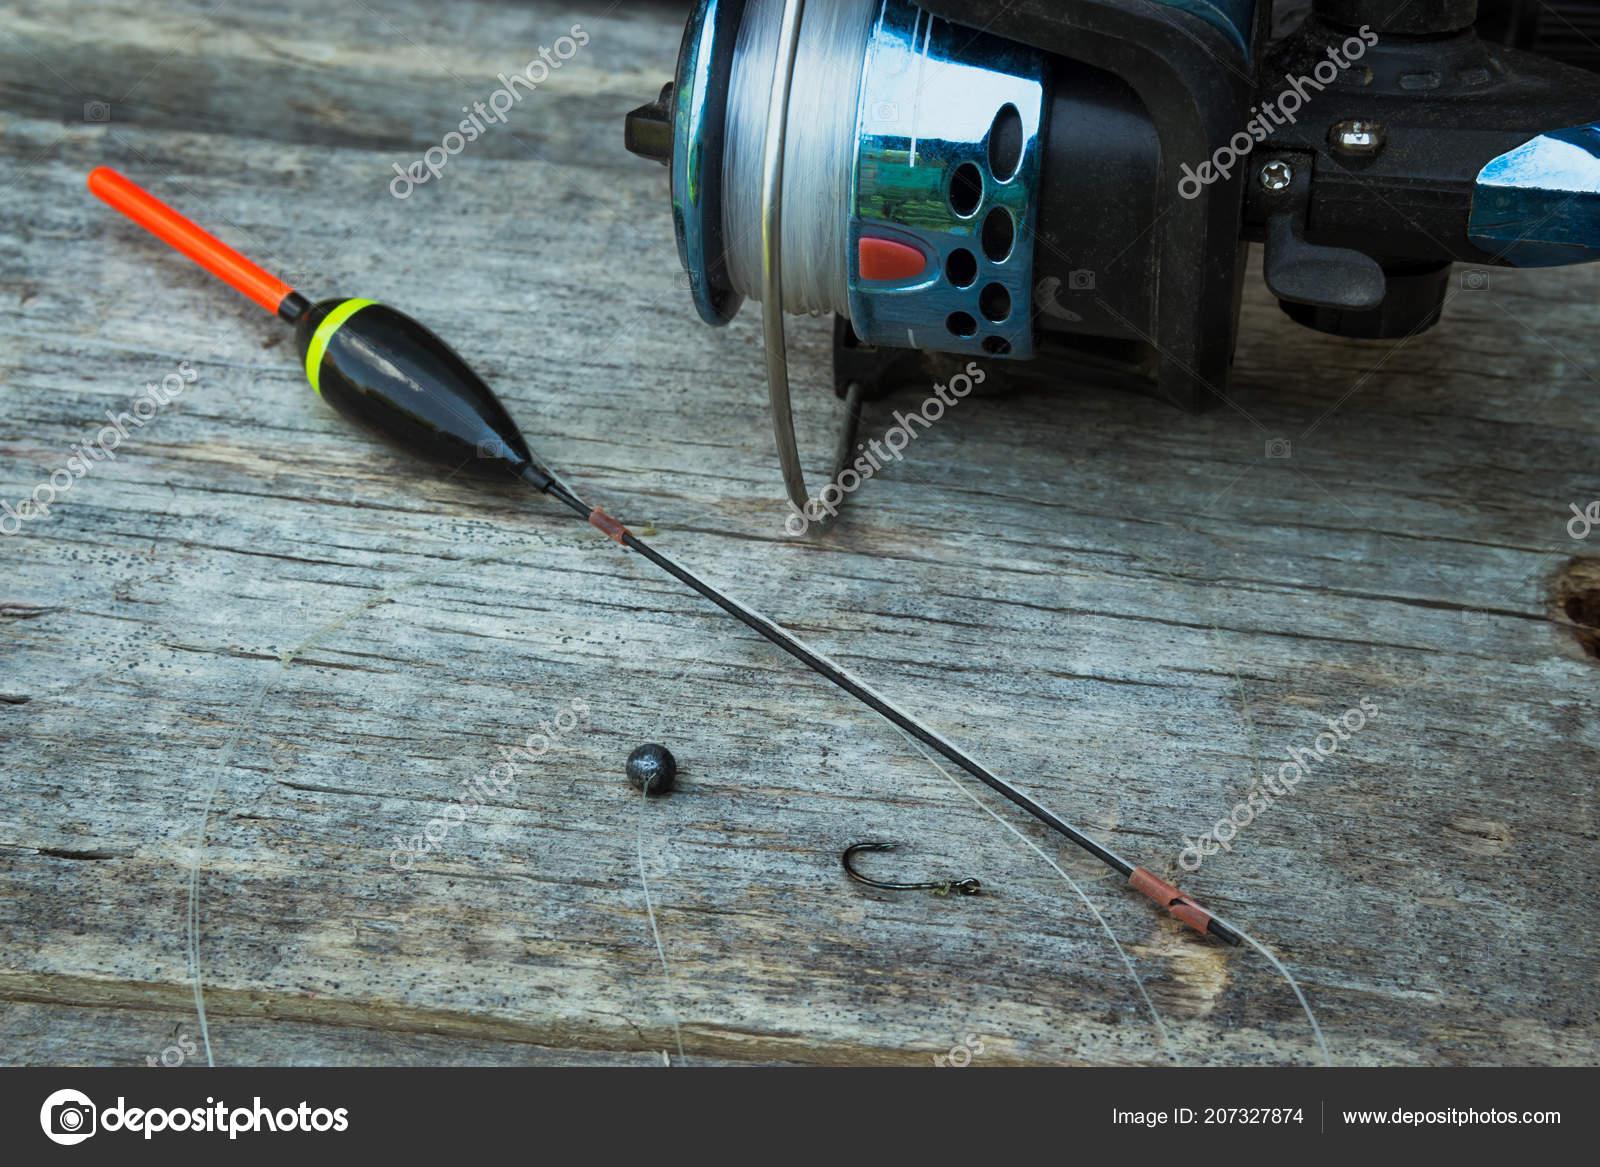 Fishing Tackle Float Fishing Line Sinker Hook Old Wooden Boards